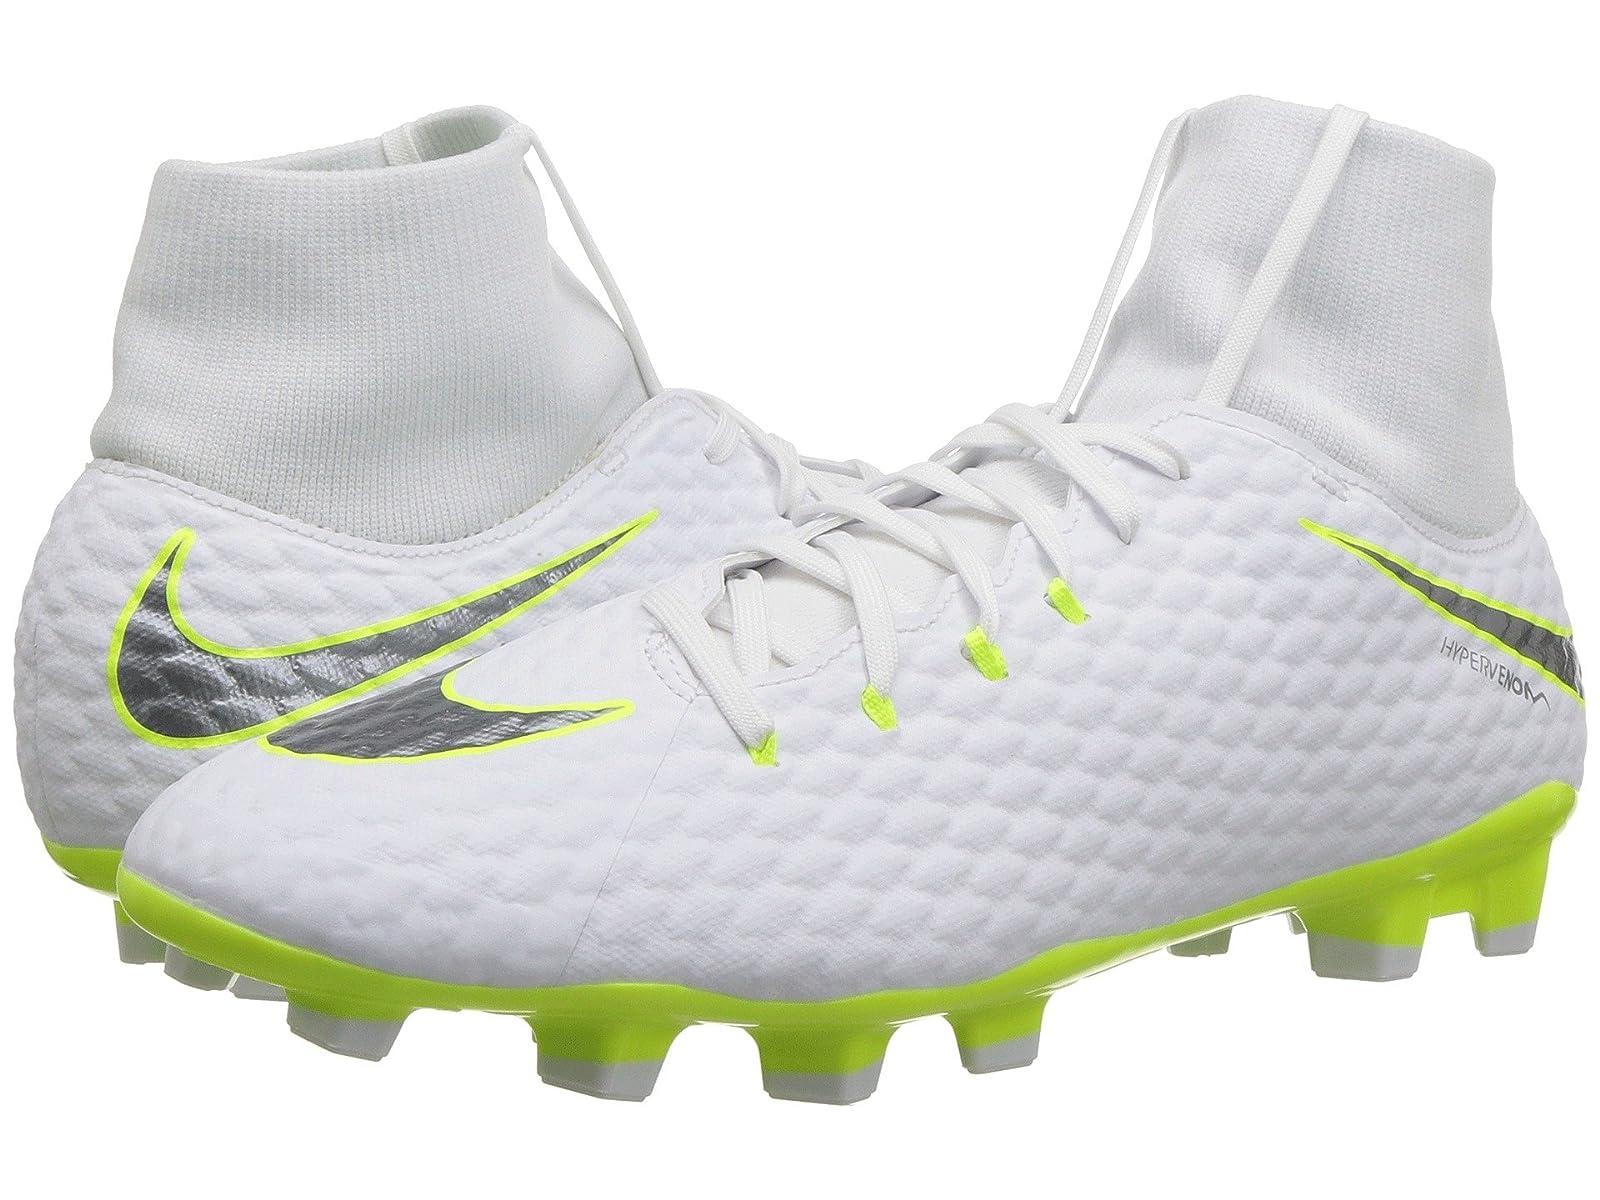 Nike Hypervenom Phantom 3 Academy Dynamic Fit FGAtmospheric grades have affordable shoes